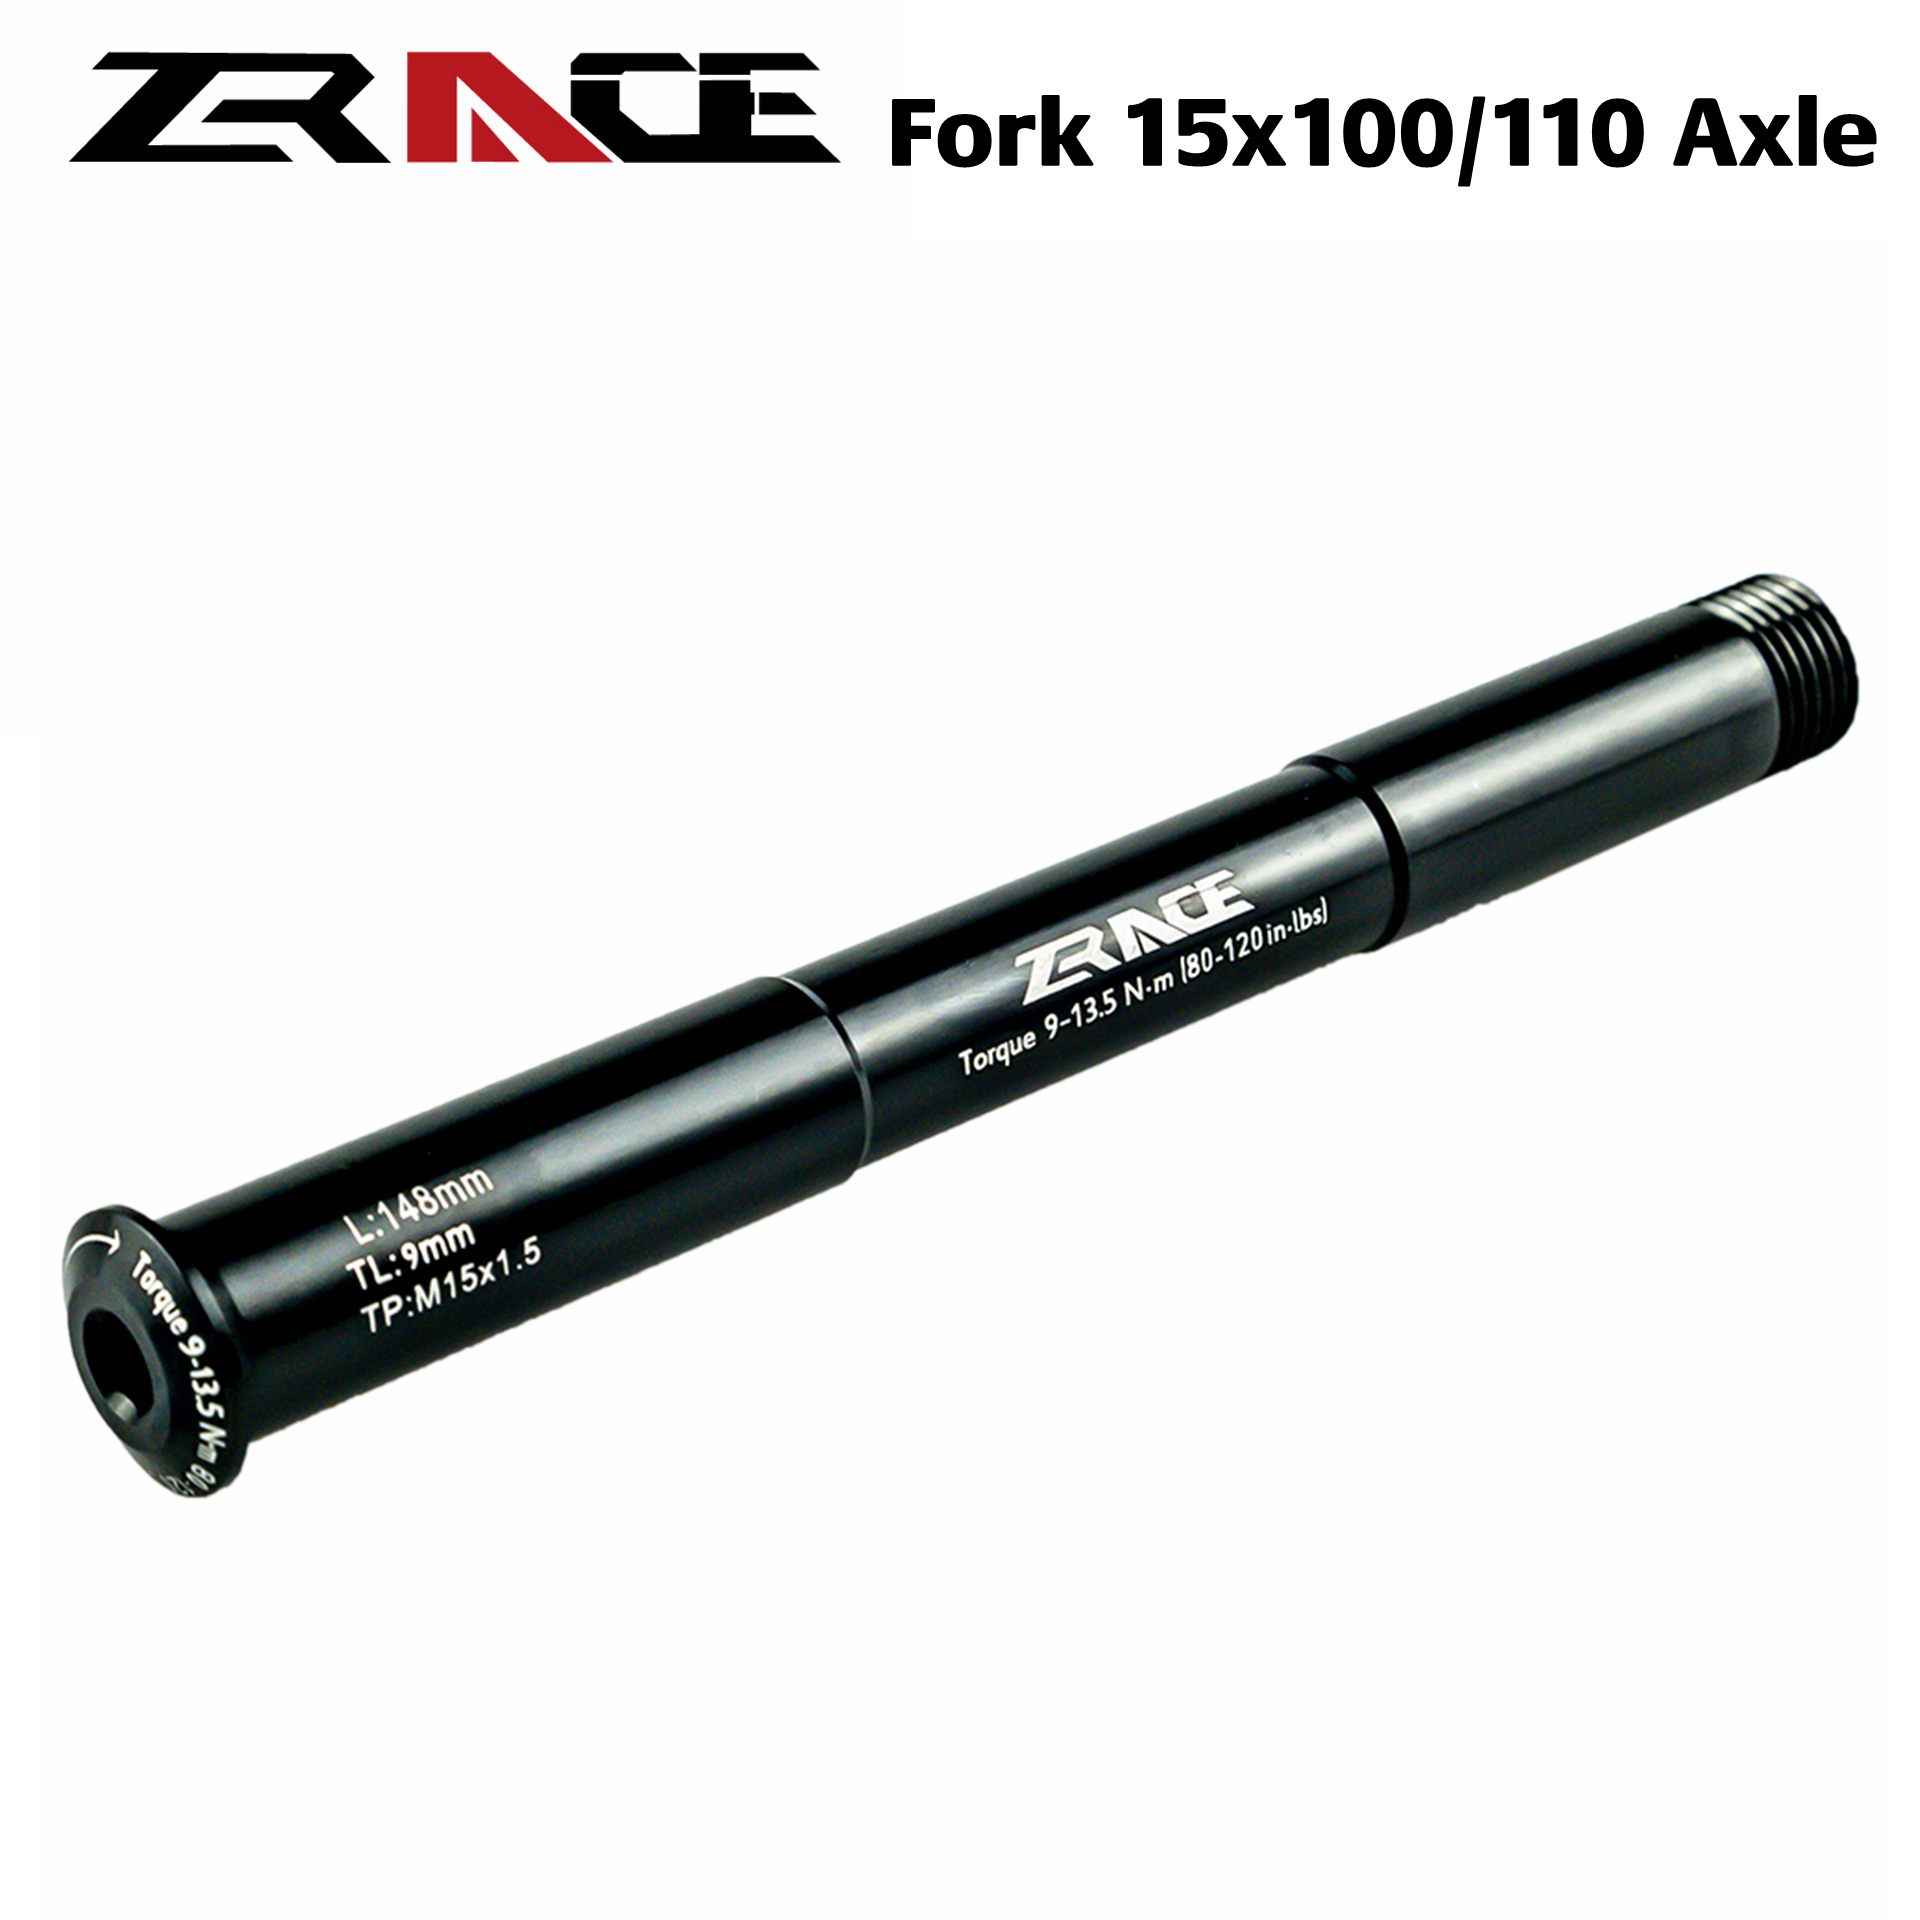 ZRACE MTB fork QR15x100 / QR15x110 Thru аксессуары для ROCKSHOX / FOX 35 г, 15x100 15x110 QR15 15*100 15*110